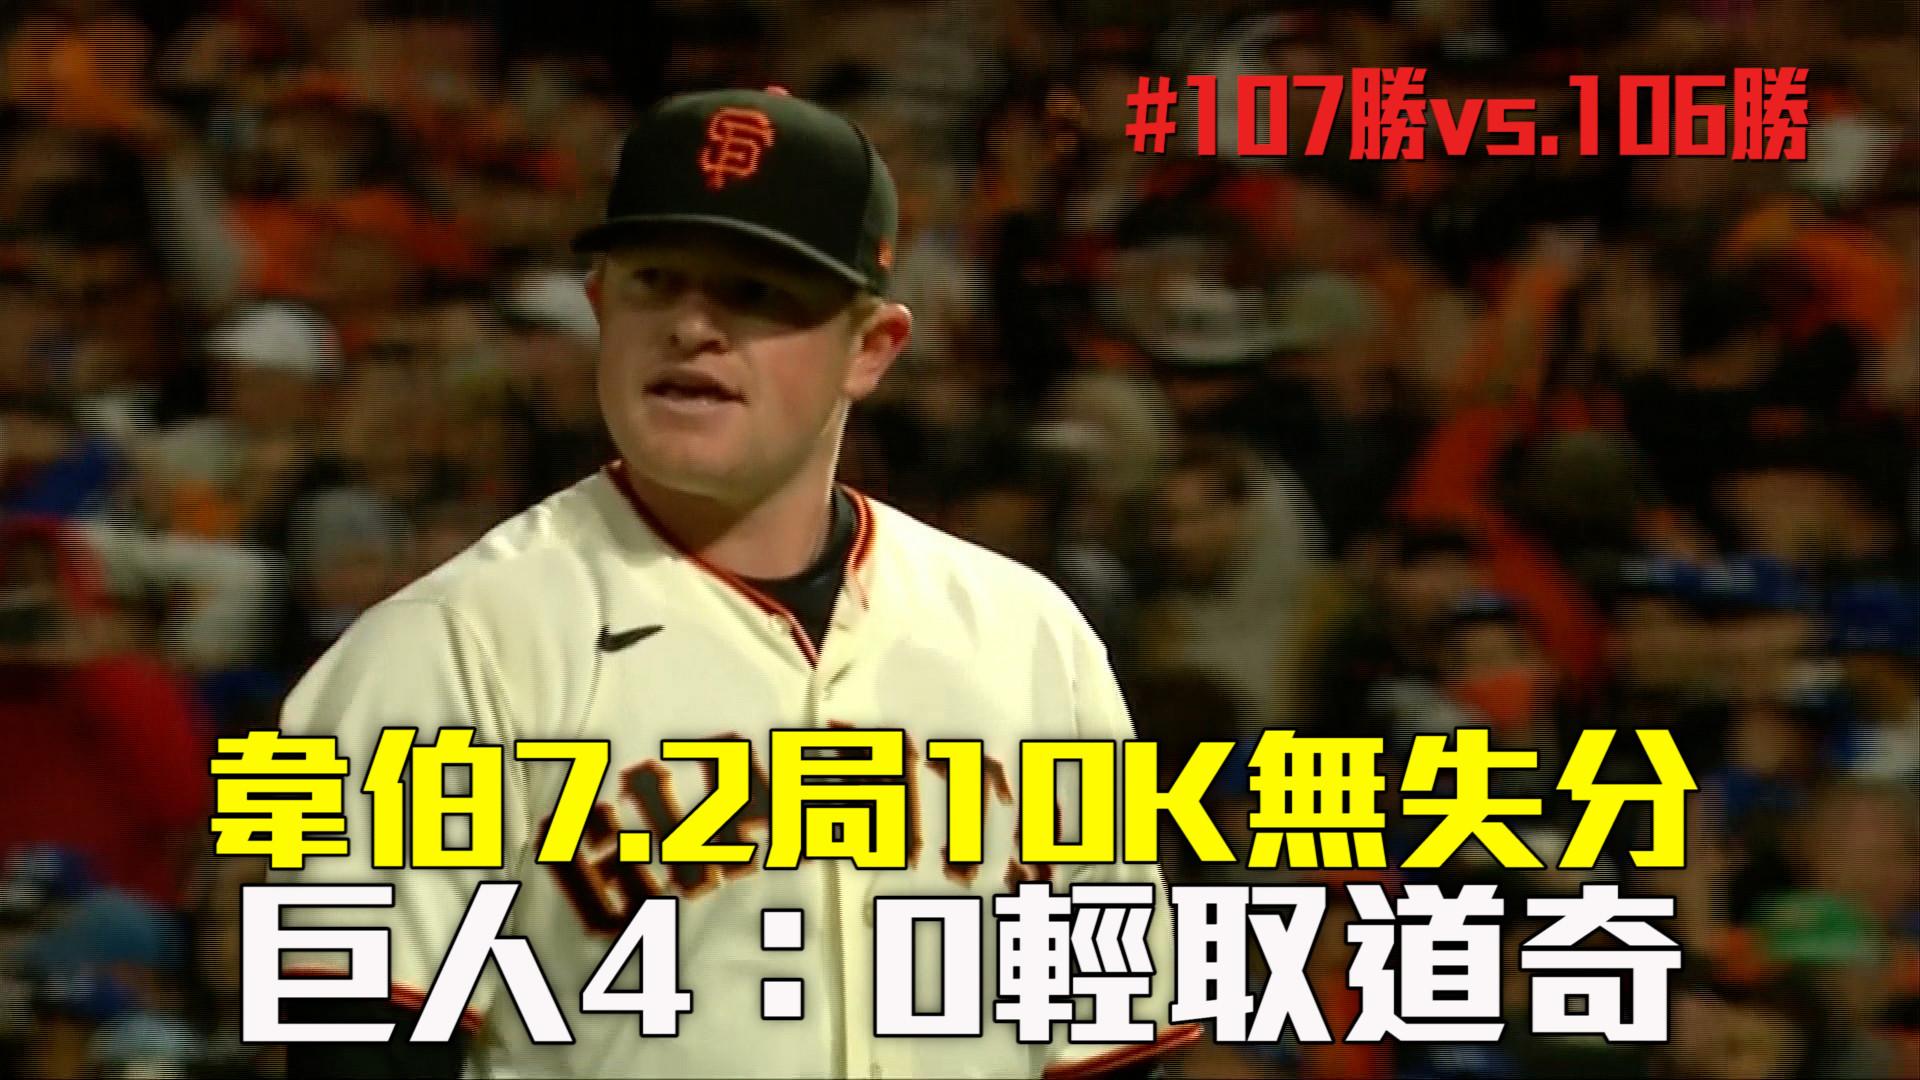 【MLB看愛爾達】韋伯7.2局10K無失分 巨人4:0輕取道奇 10/9